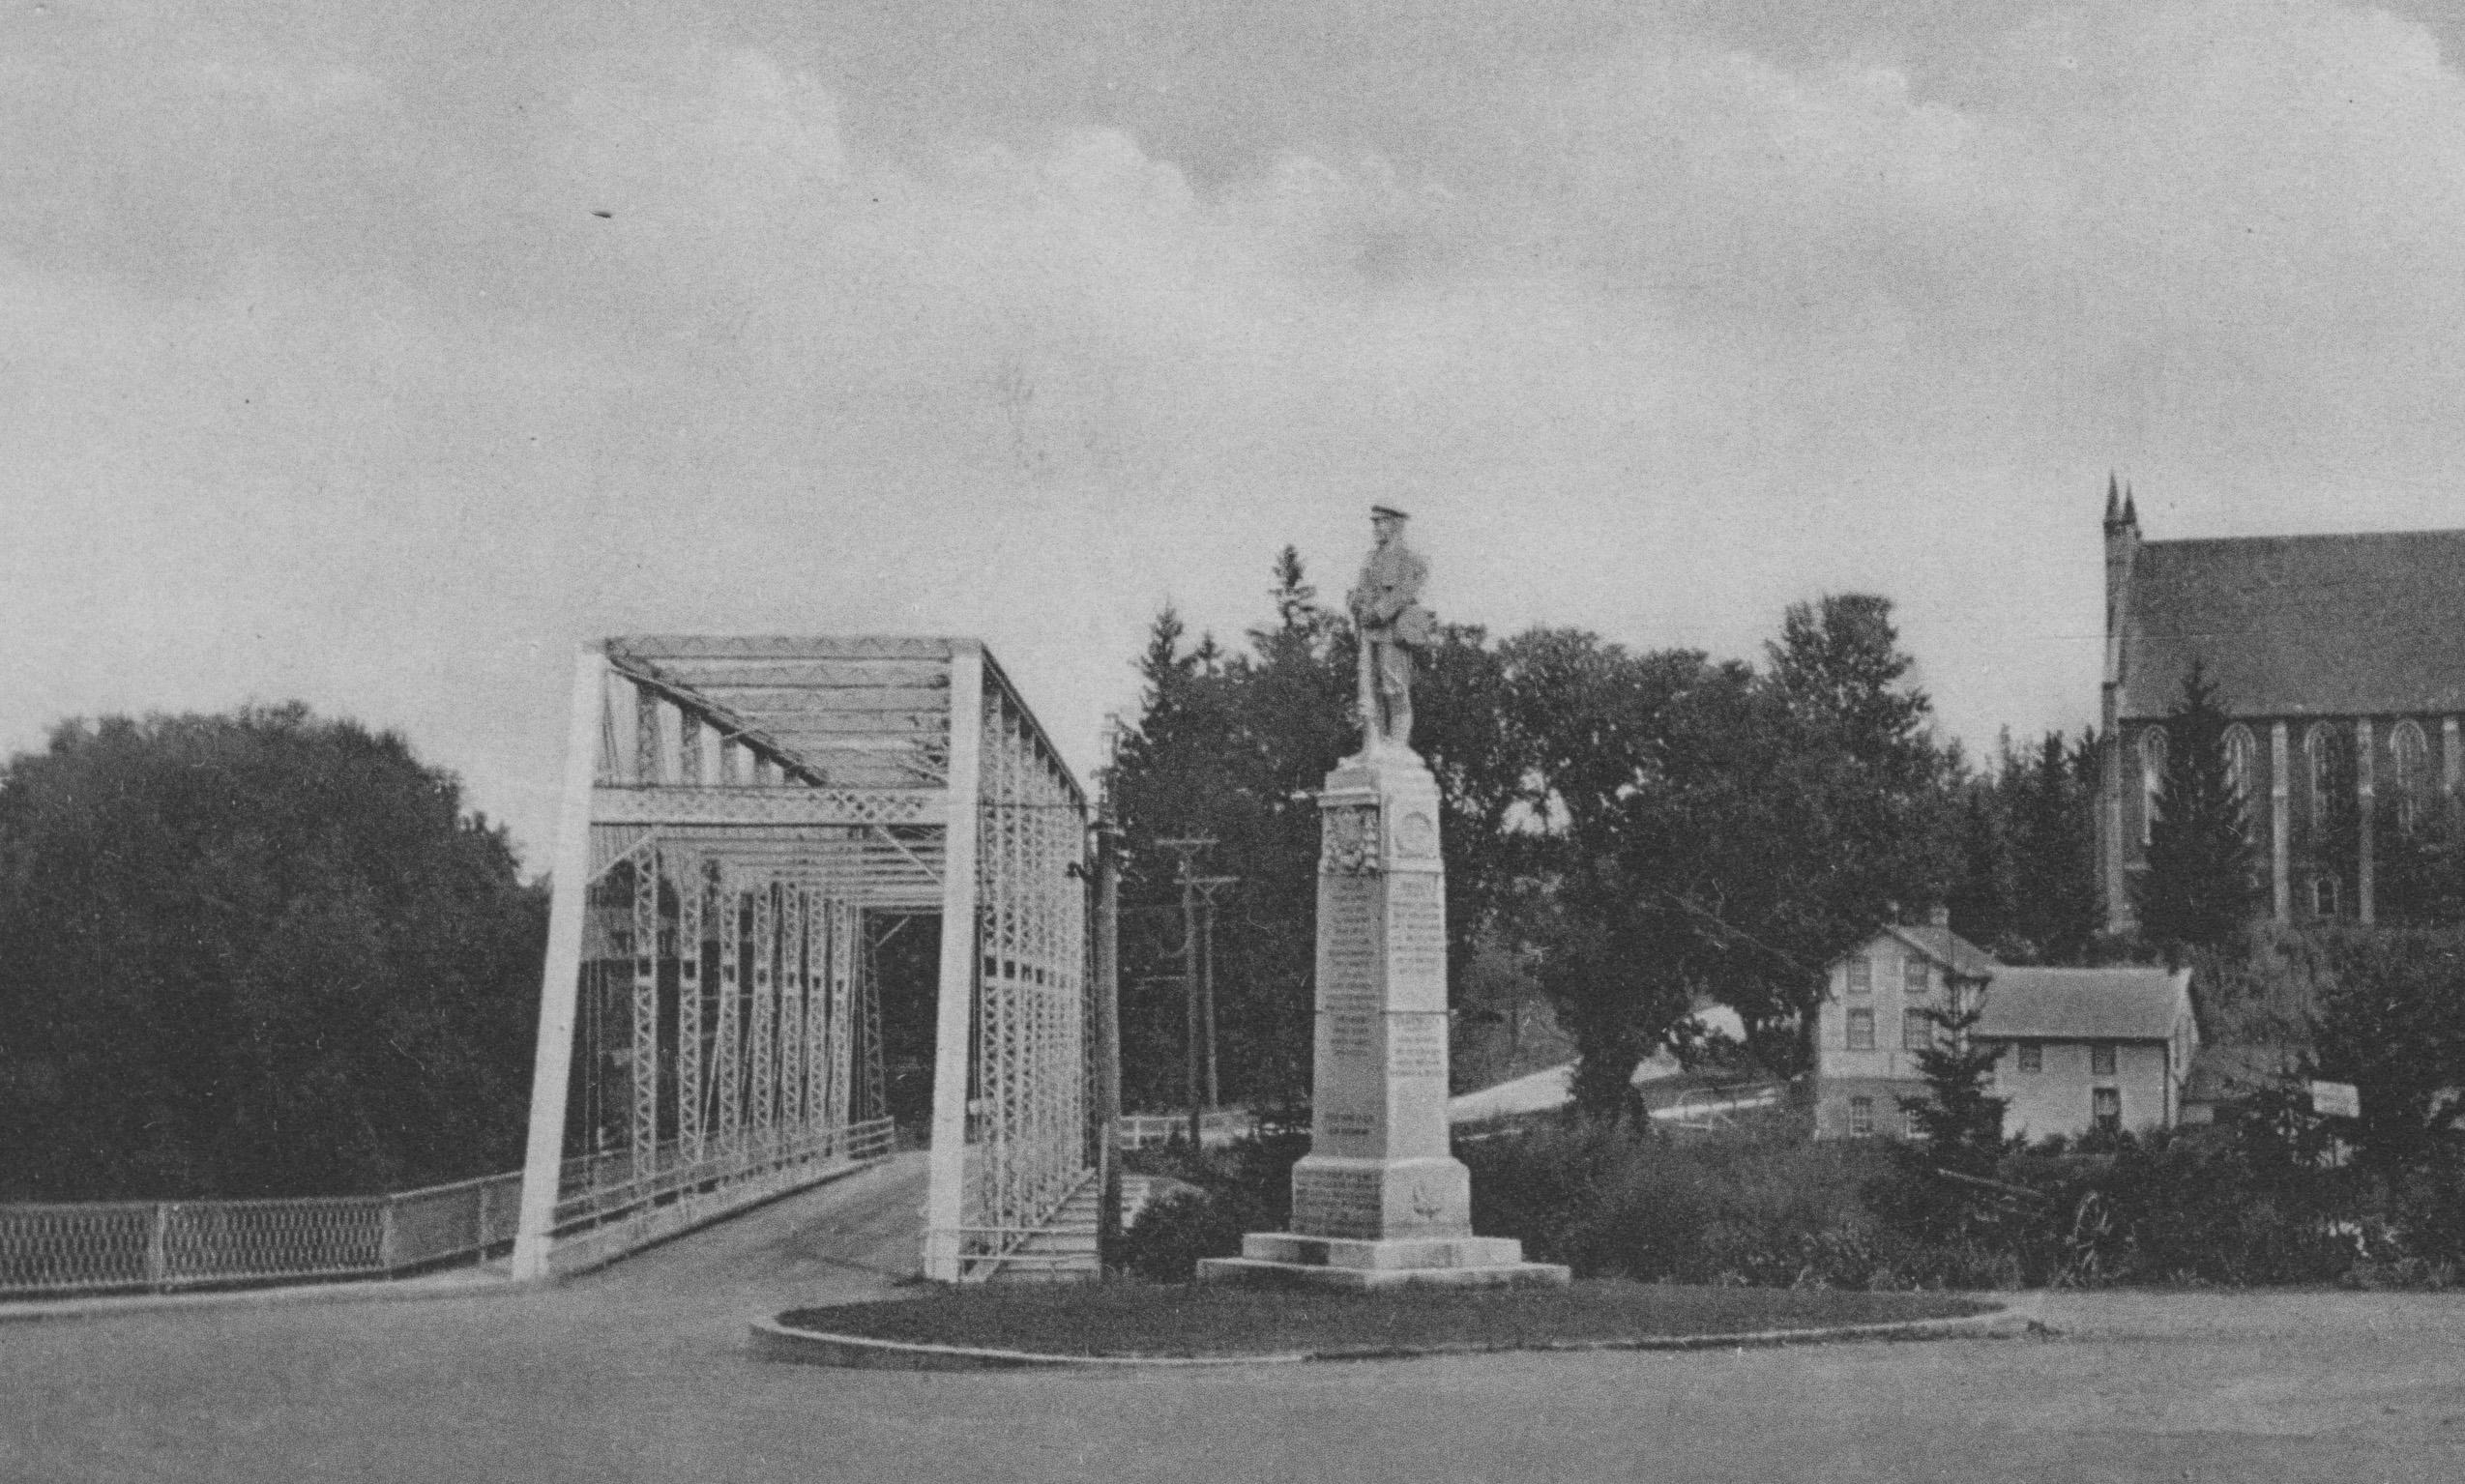 Paisley Cenotaph